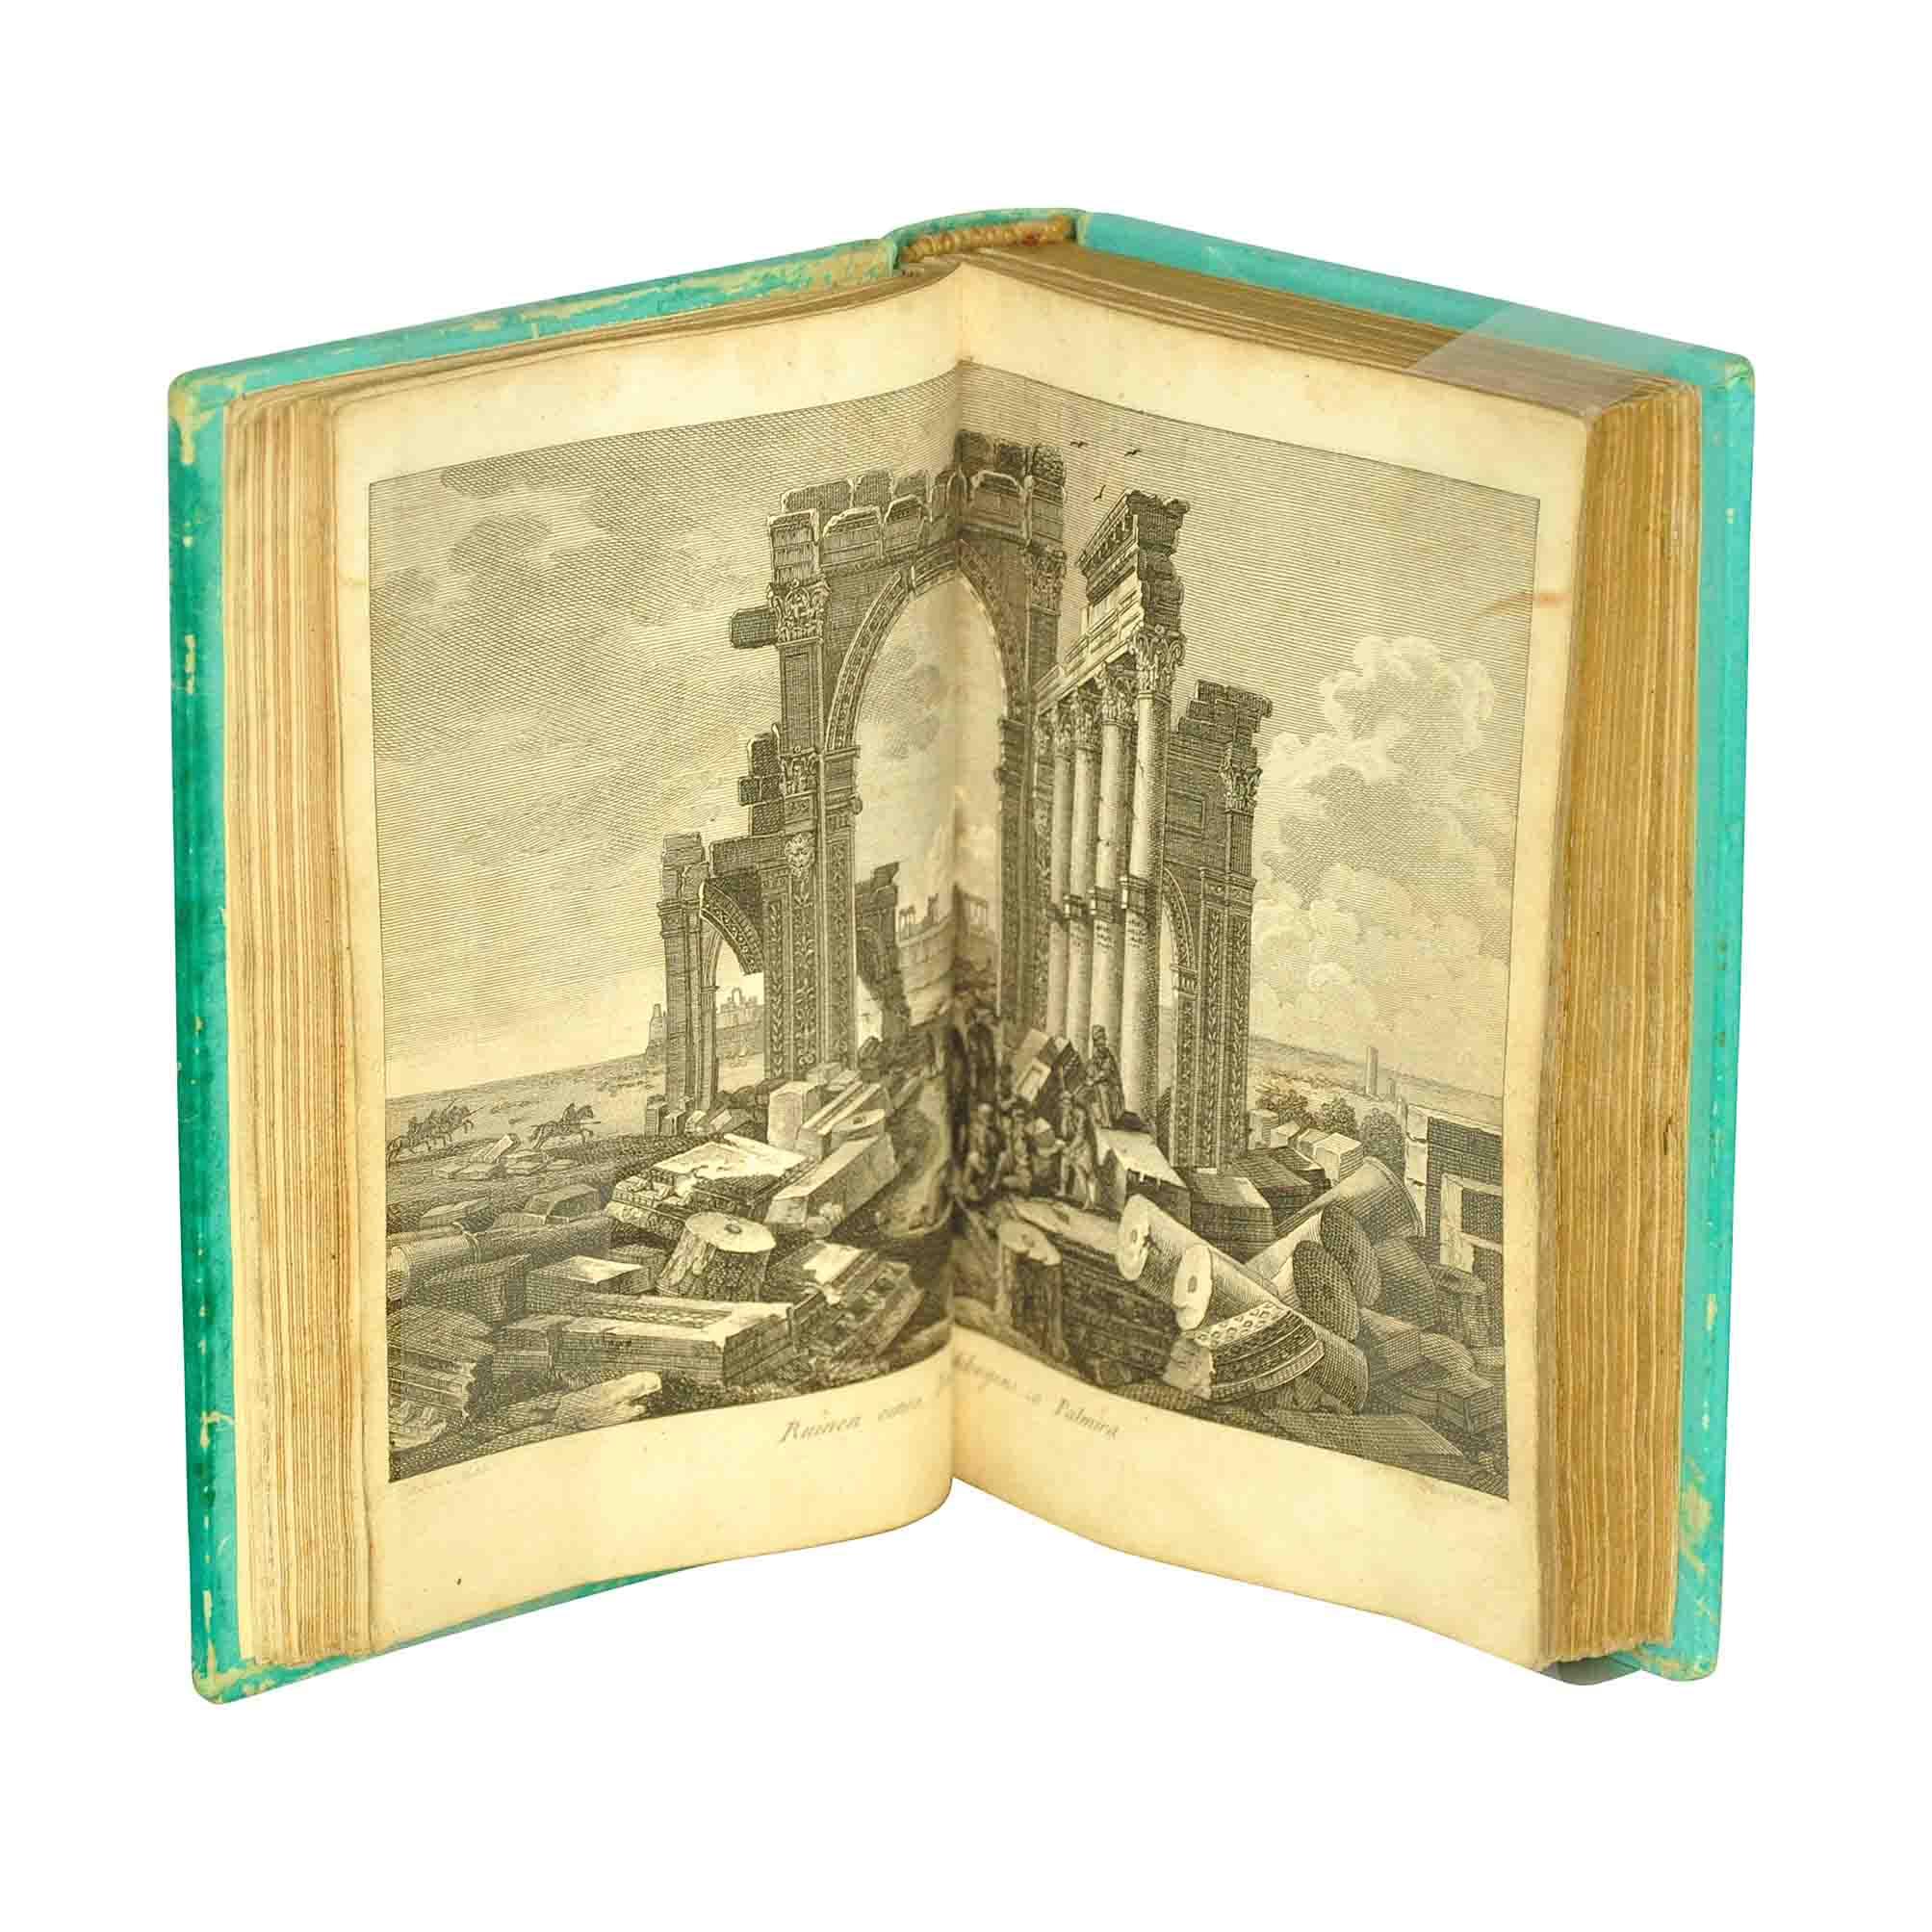 5472-Wiener-Taschenbuch-1804-Palmyra-Plate-Palmyra-A-N.jpg